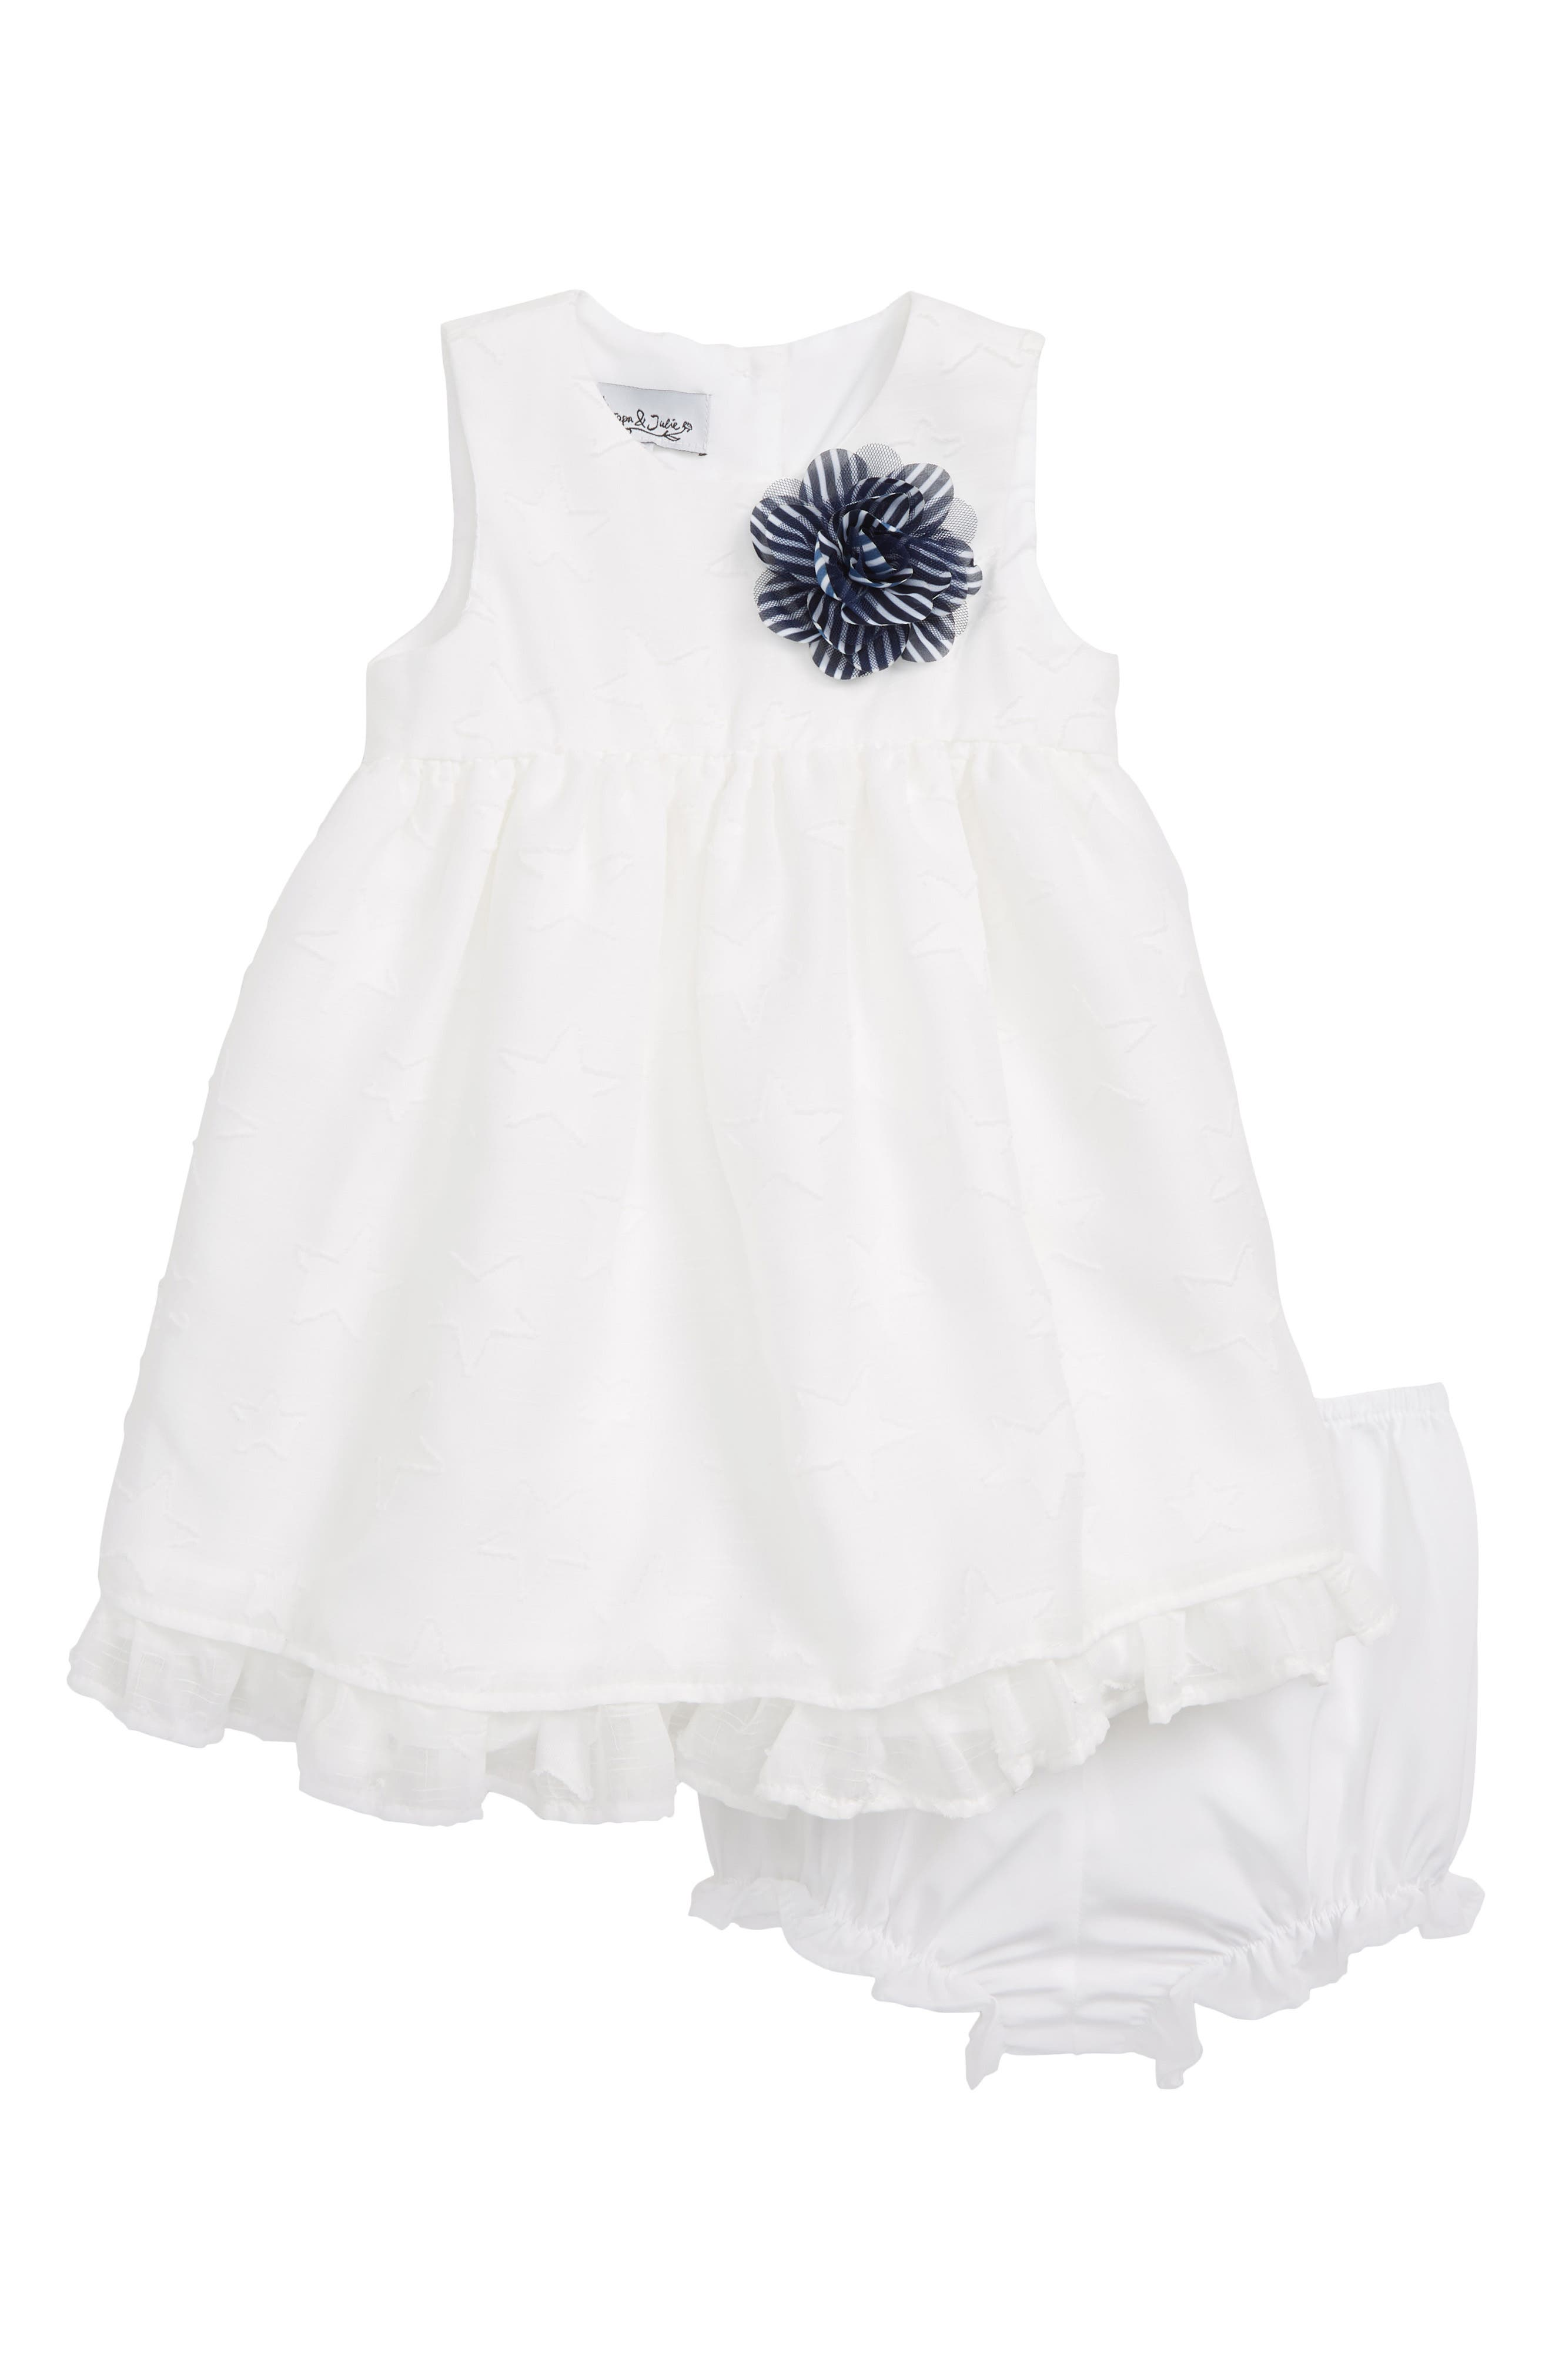 PIPPA & JULIE,                             White Star Dress,                             Main thumbnail 1, color,                             WHITE